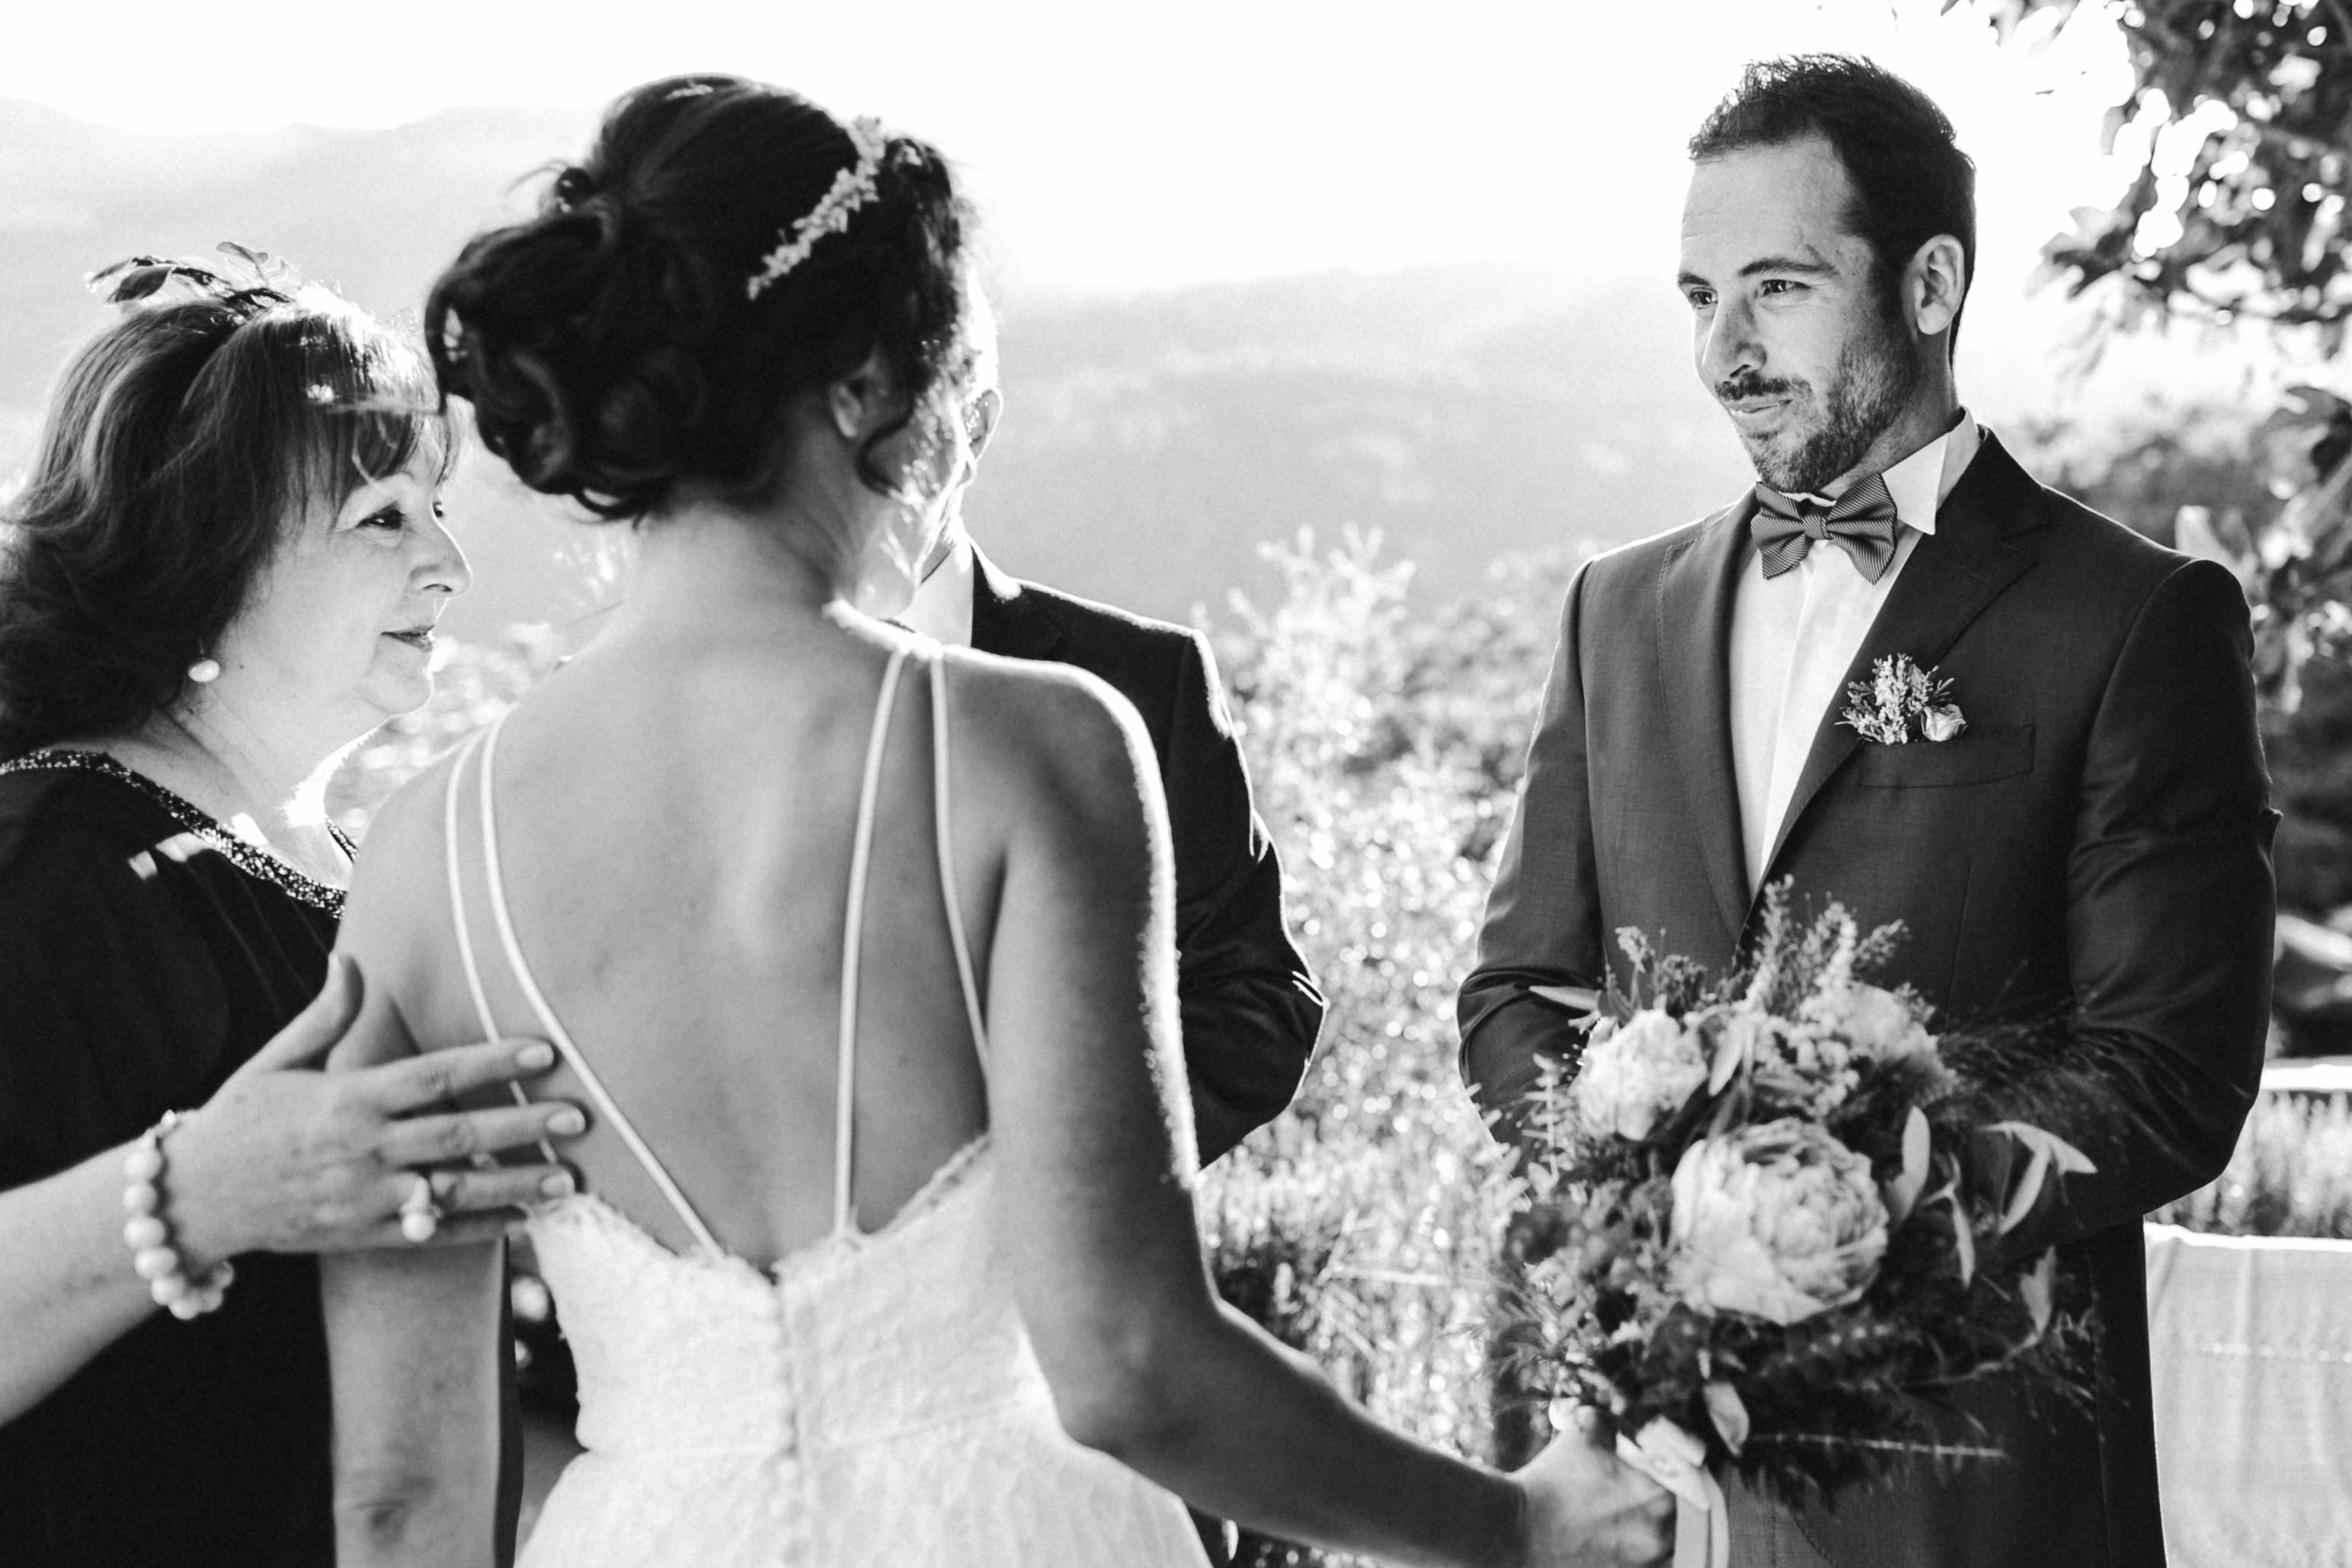 Boda rústica en la montaña. fotgrafo de bodas barcelona_051